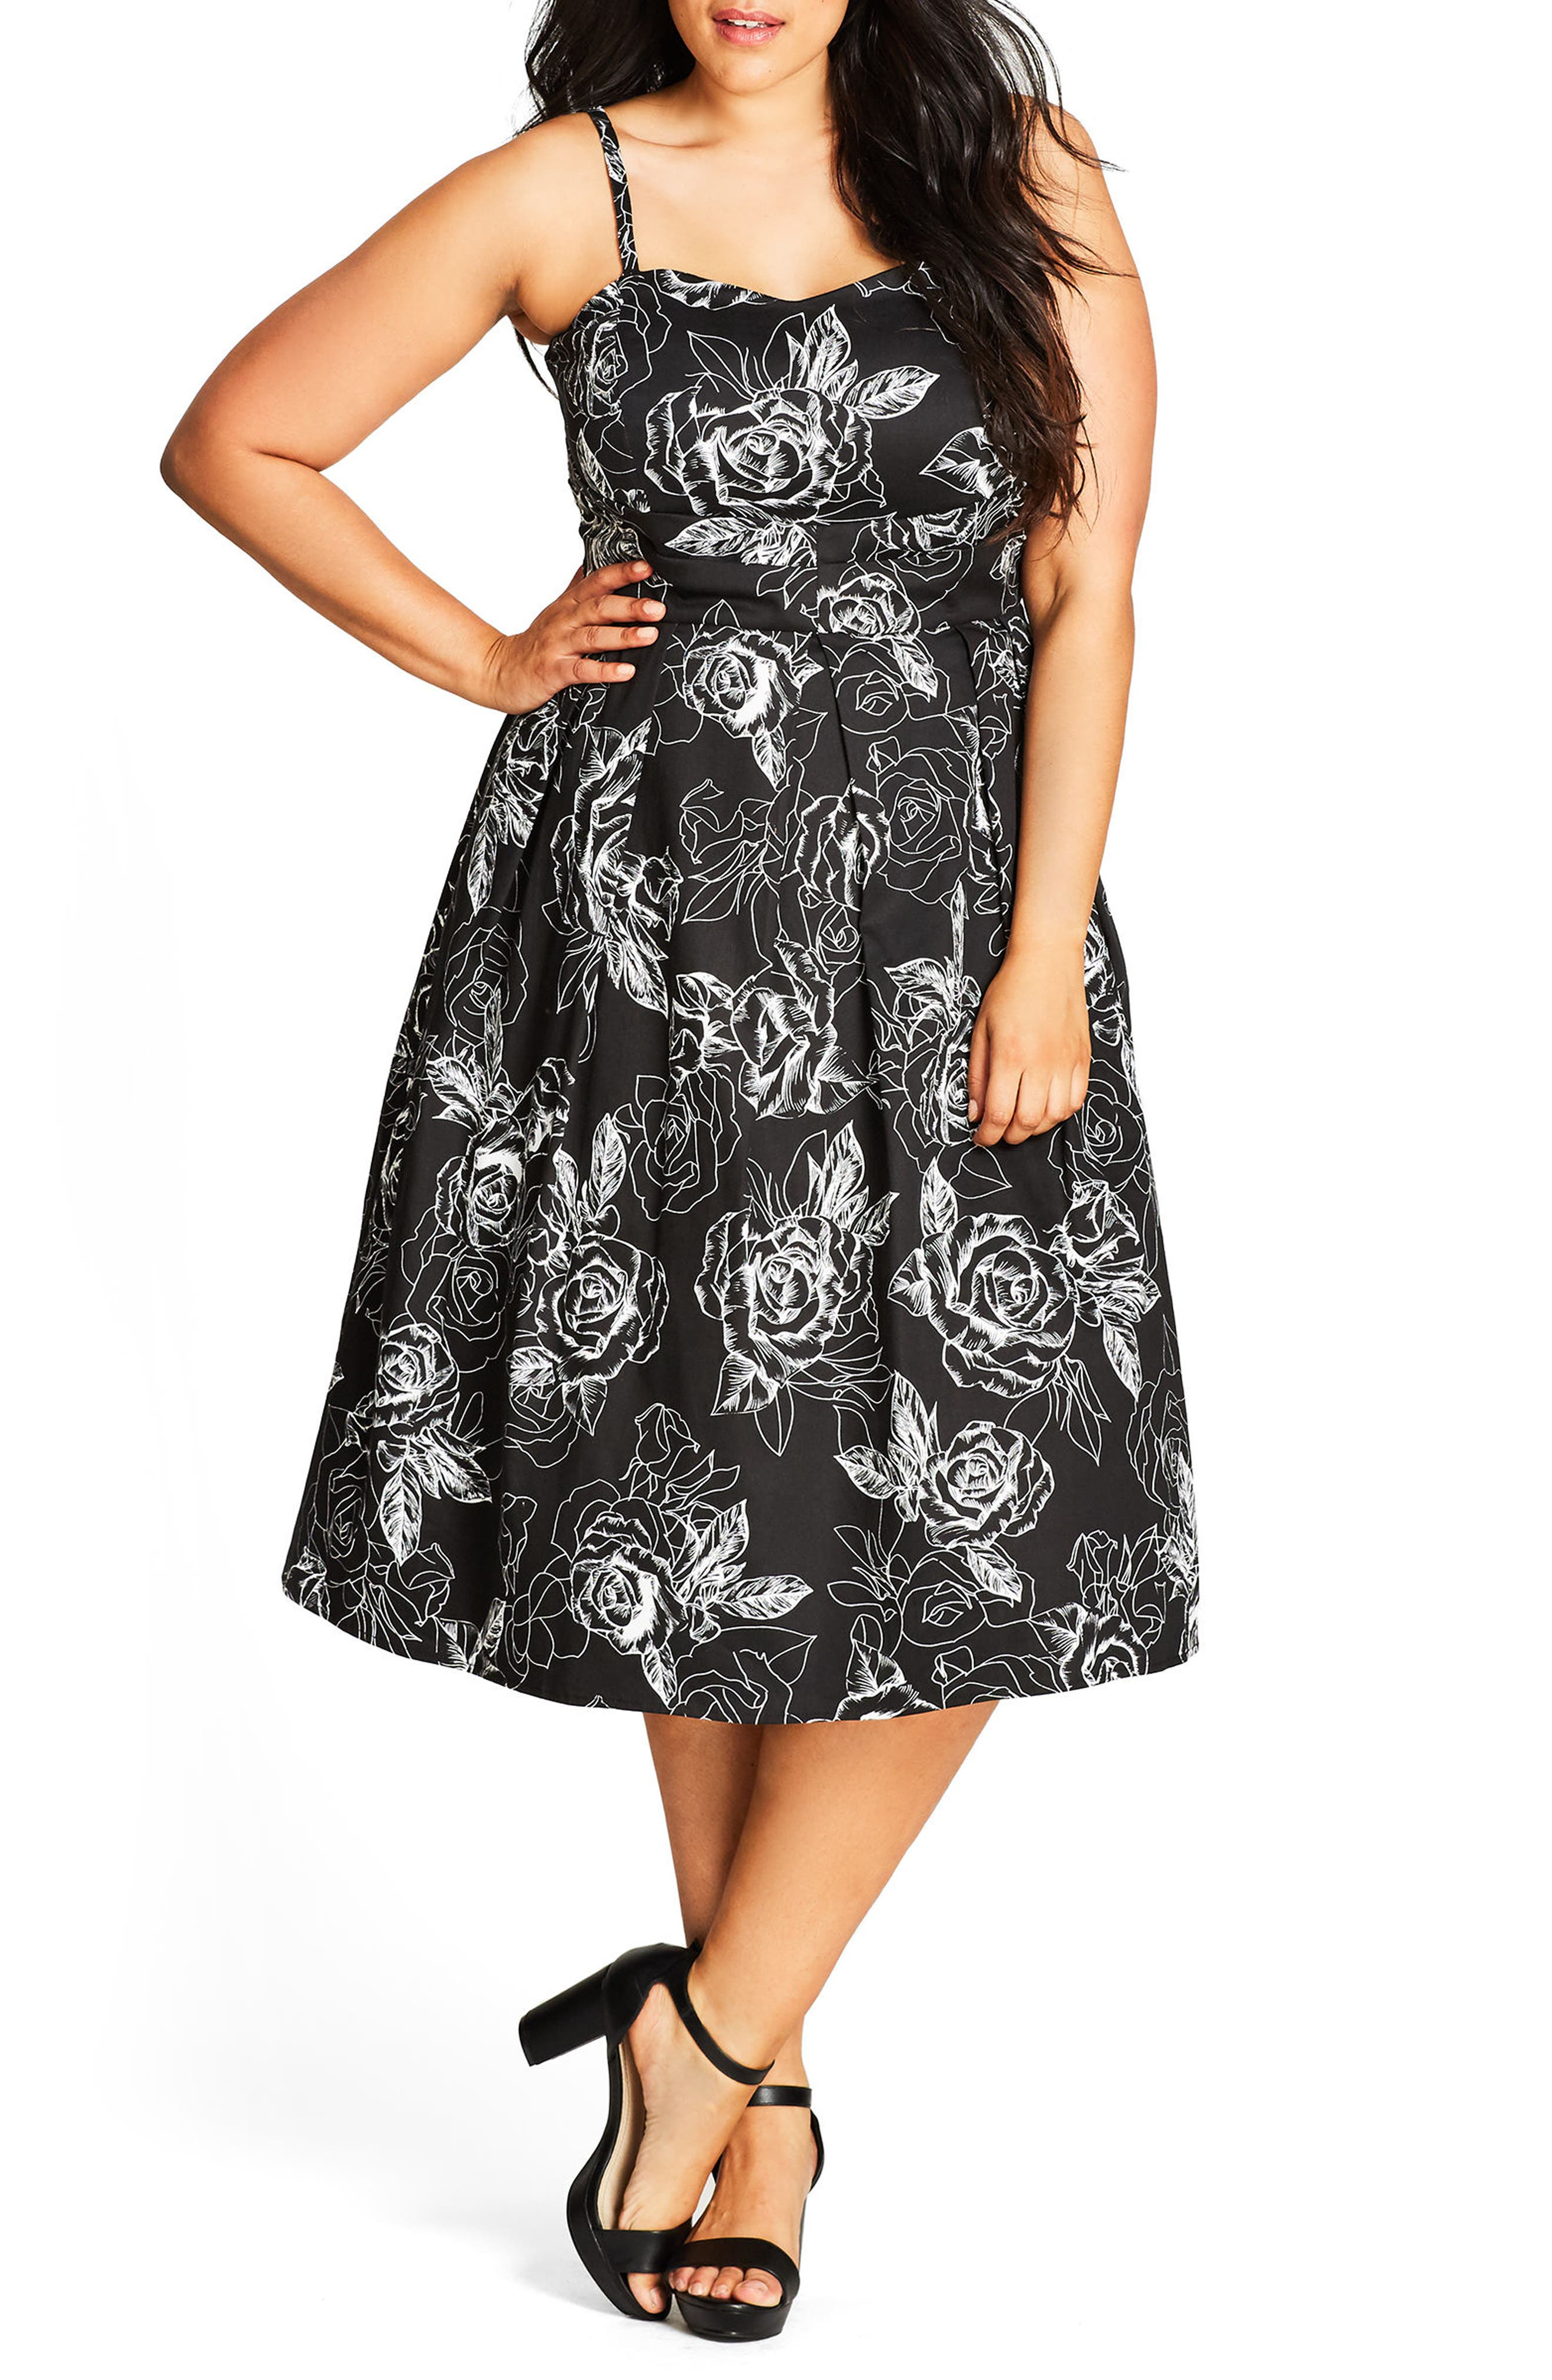 Main Image - City Chic Mono Garden Fit & Flare Dress (Plus Size)